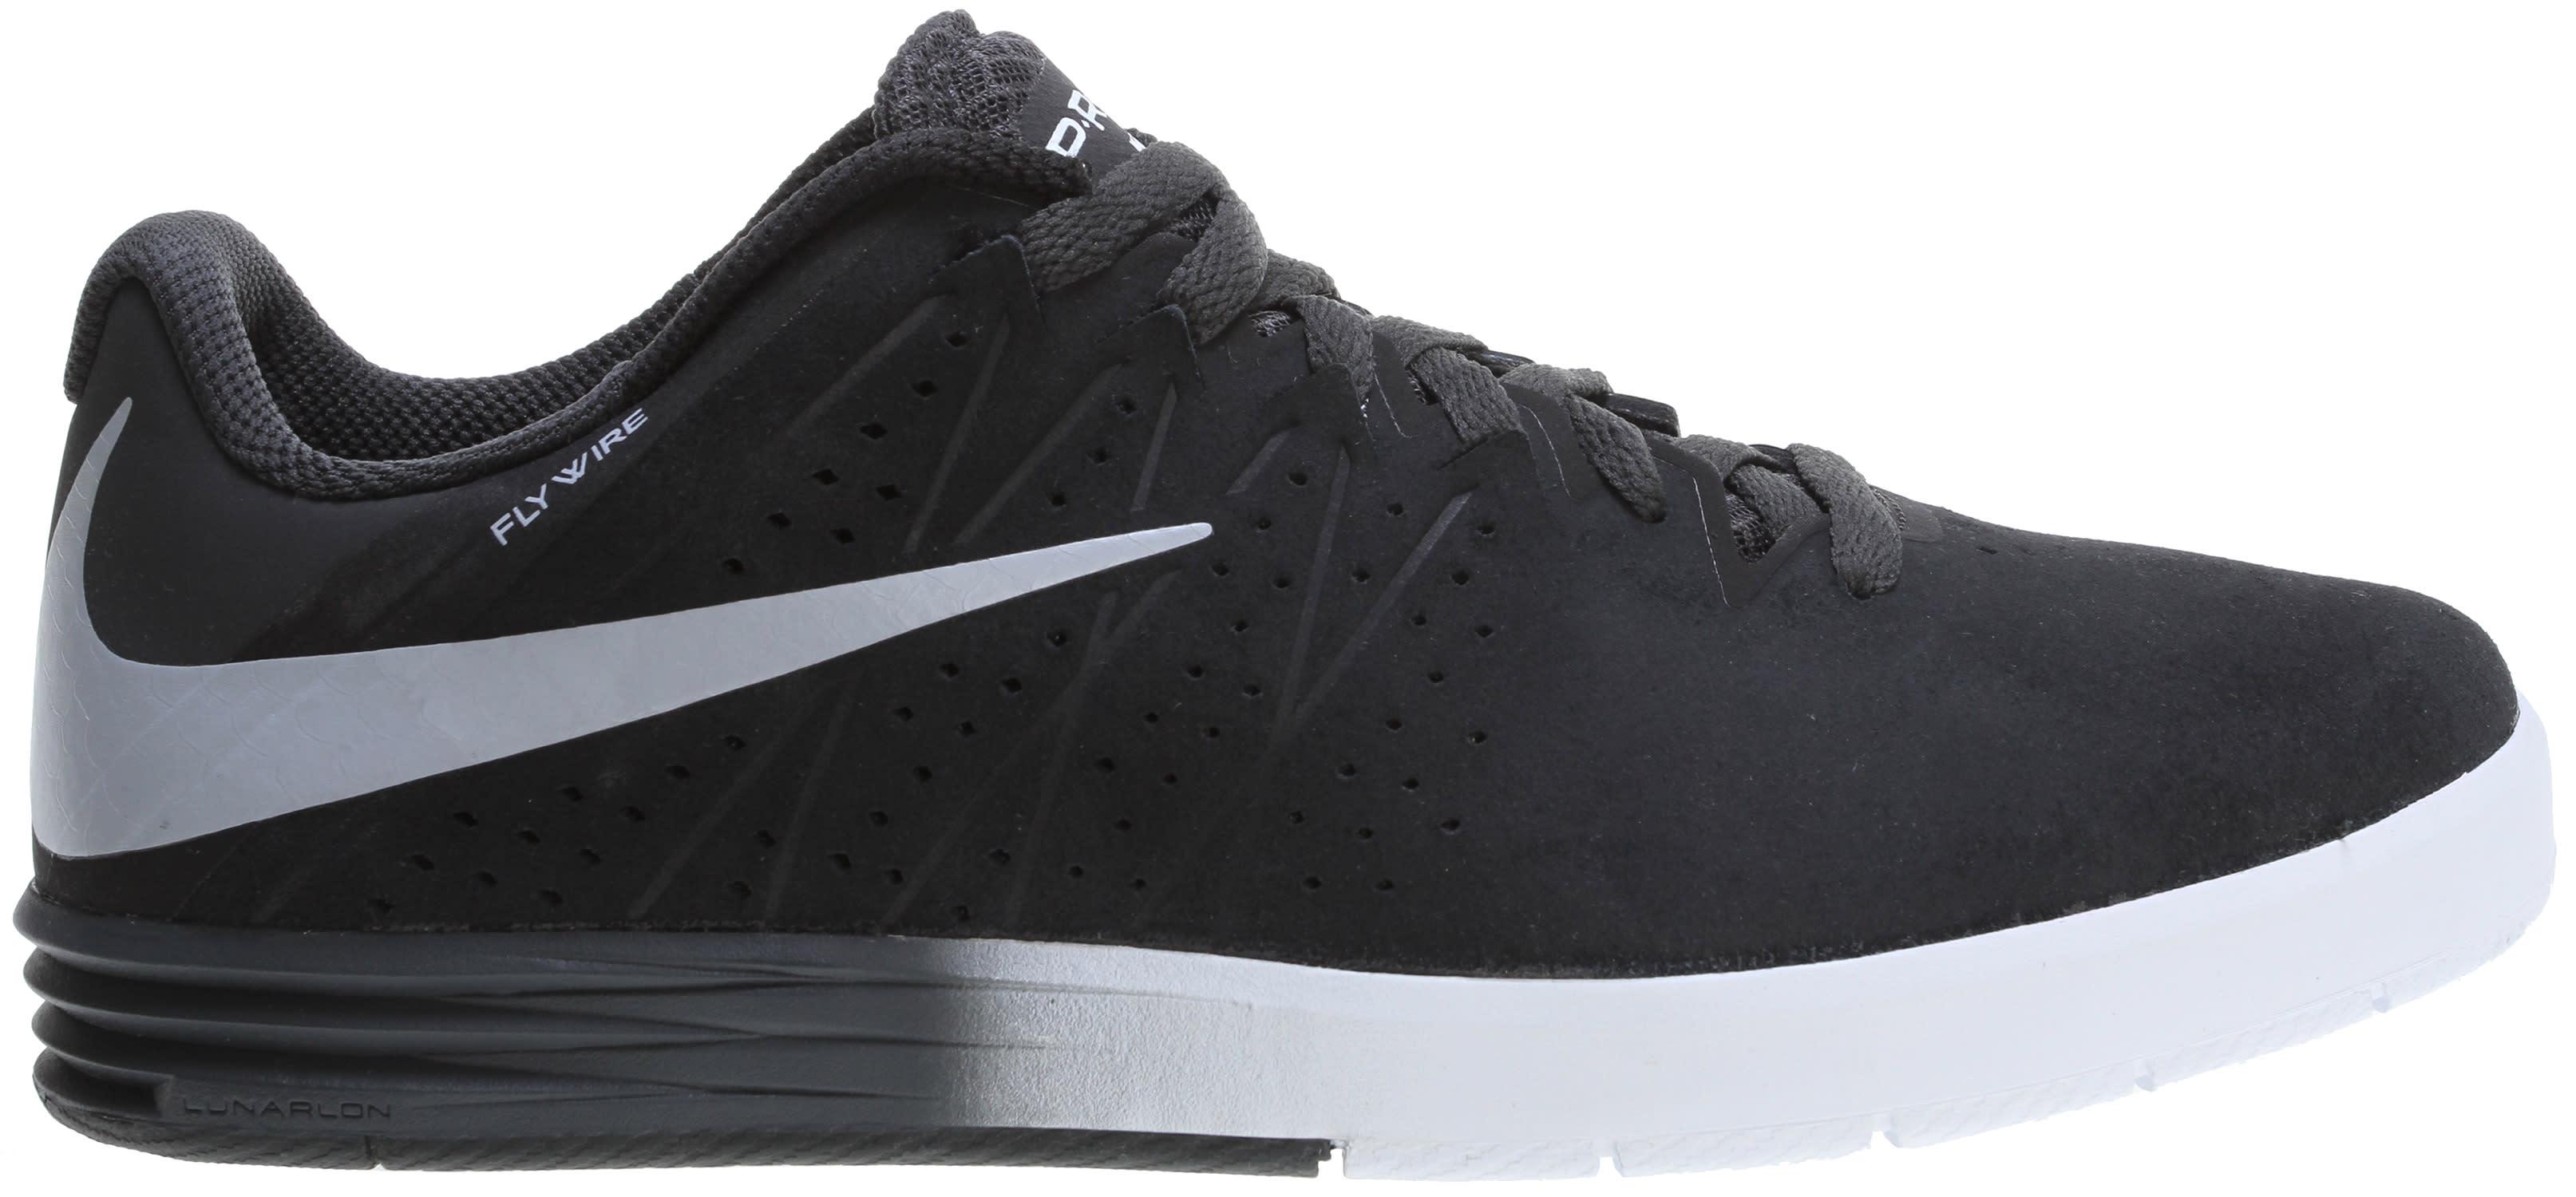 Nike Paul Rodriguez Citadel SB Skate Shoes - thumbnail 1 c1b9cafc1